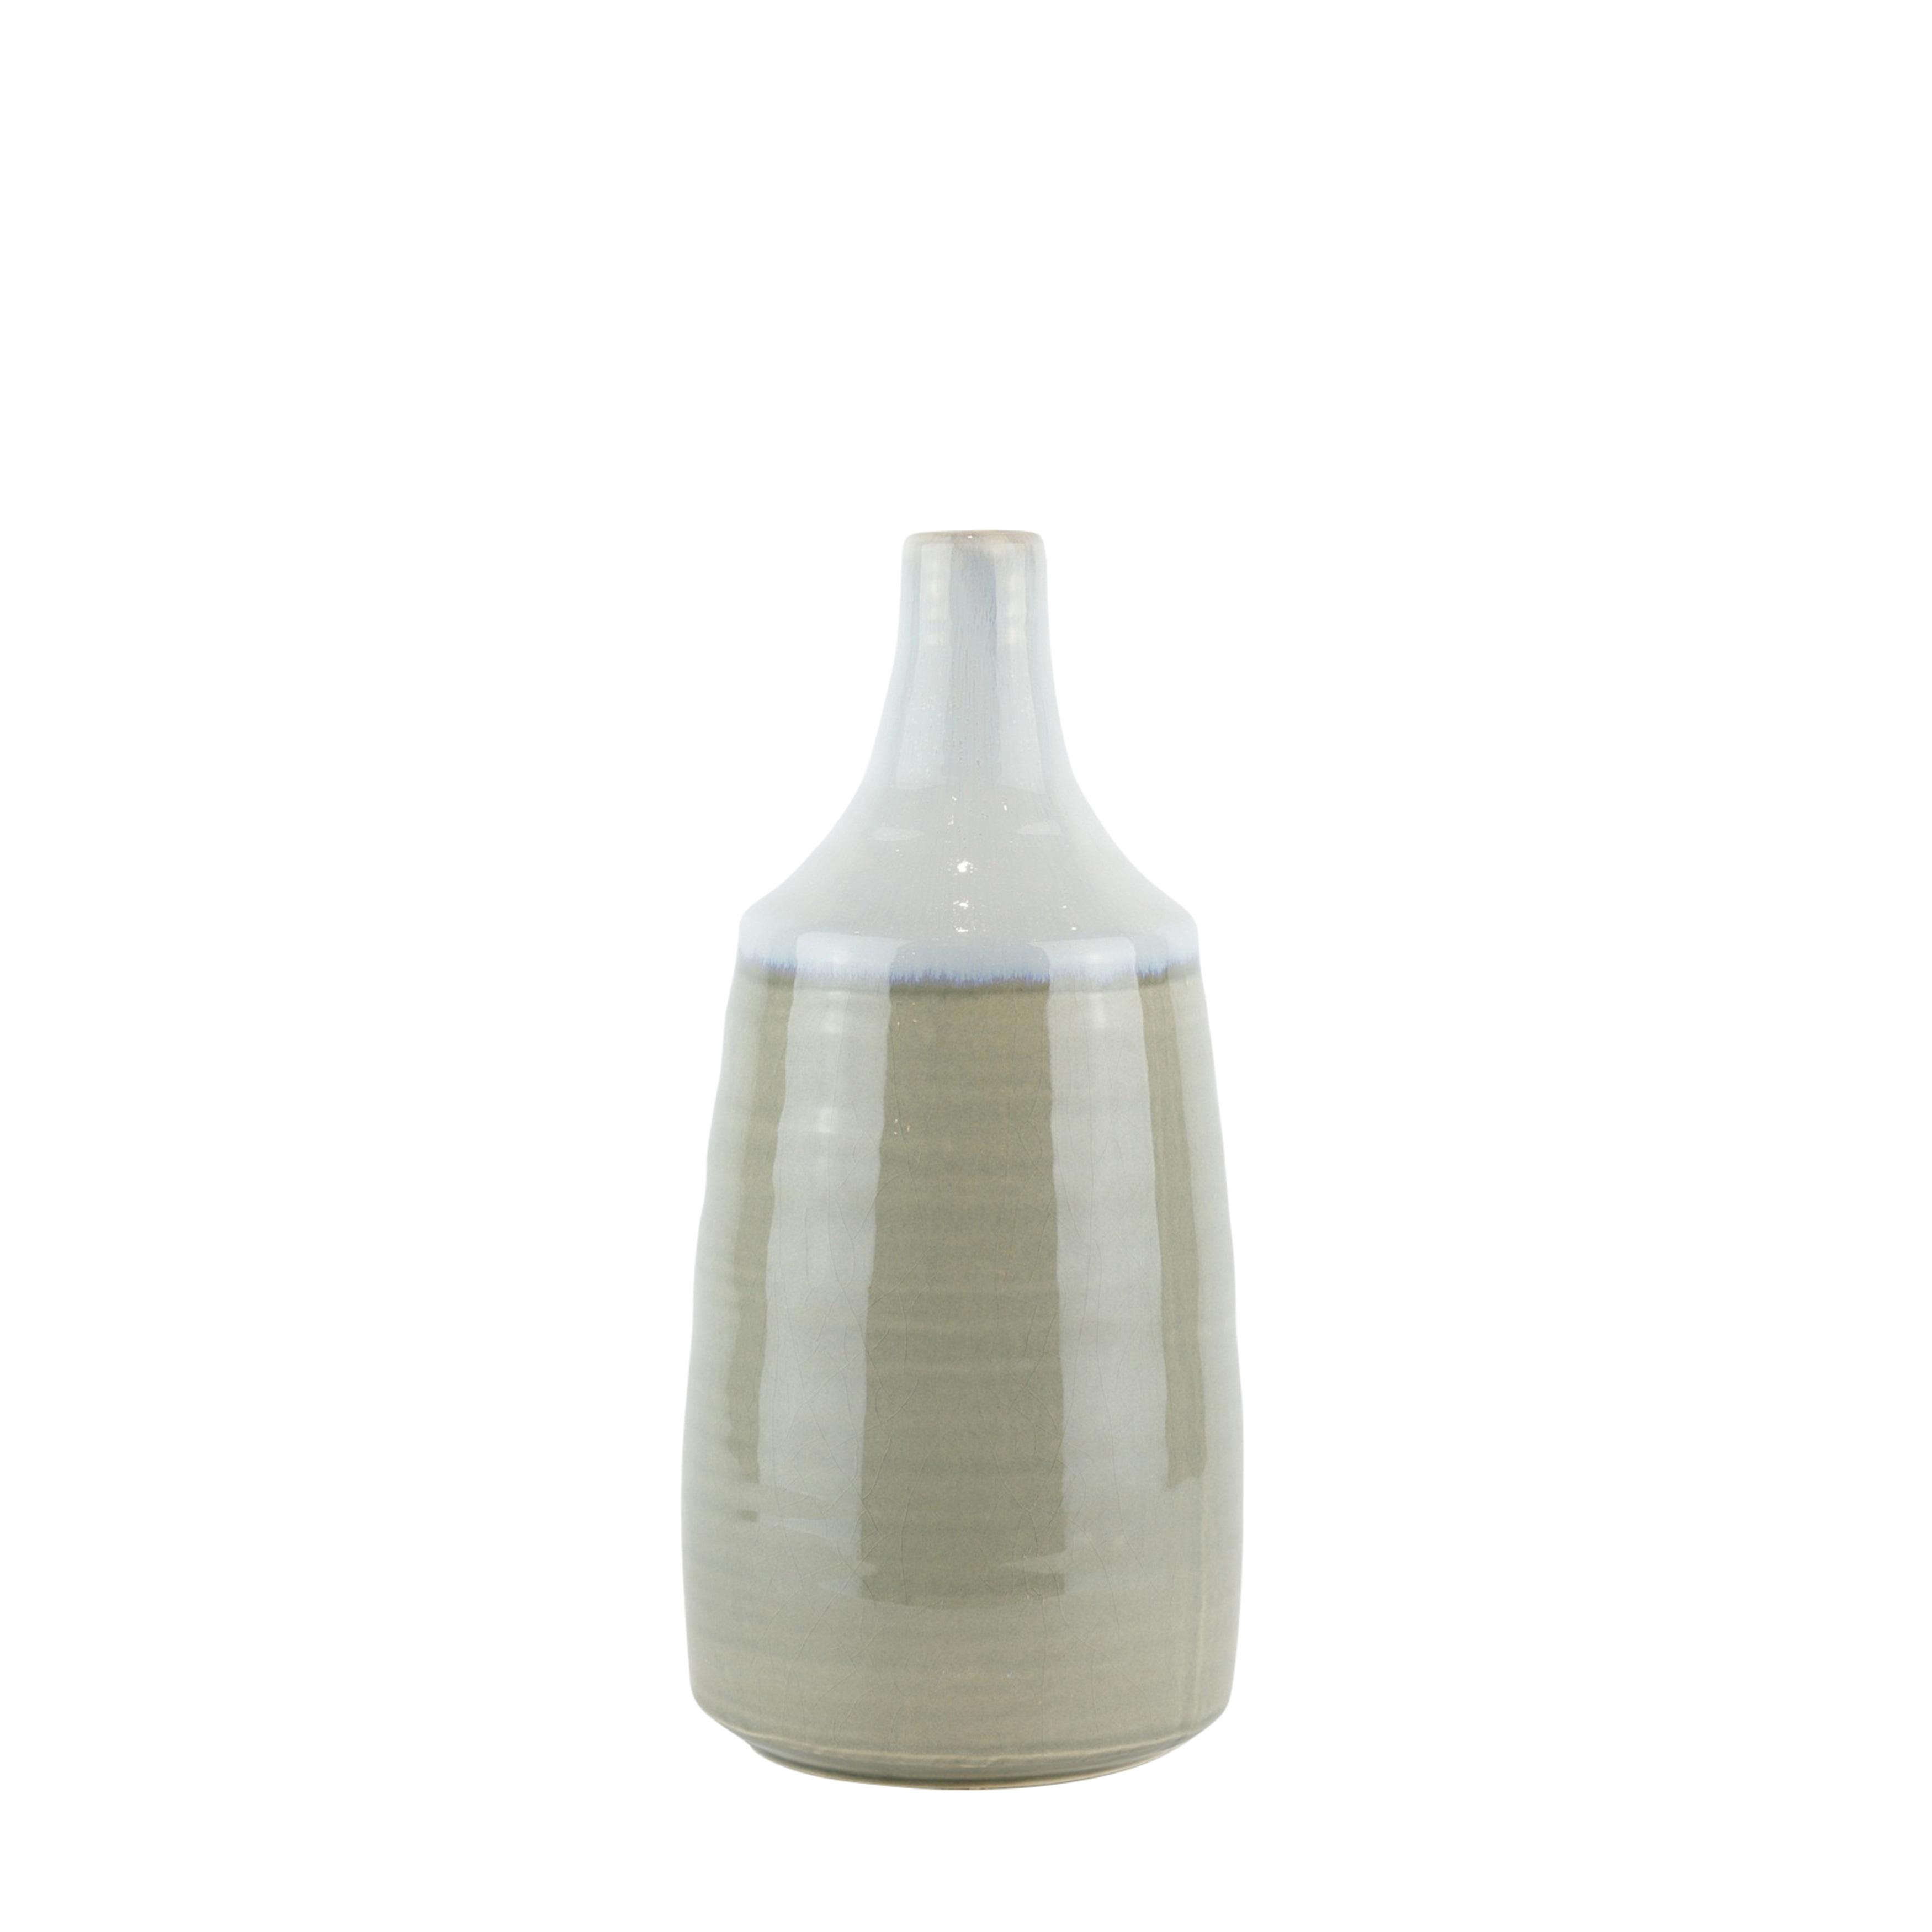 Round Shape Decorative Ceramic Vase with Elongated Neck, White and Gray